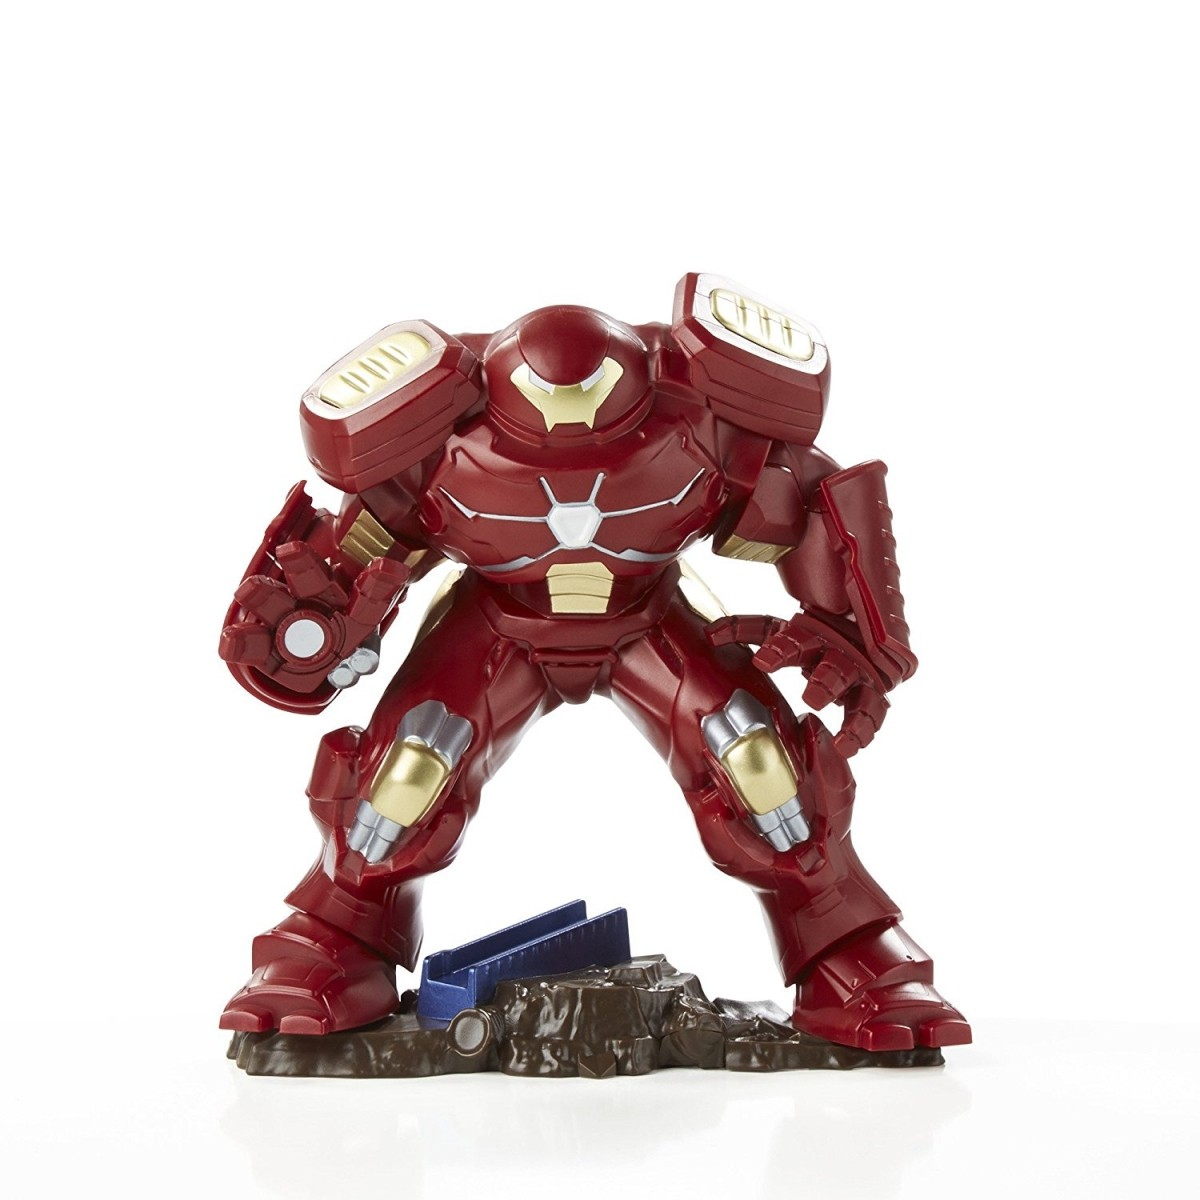 Boneco Hulkbuster: Os Vingadores (Avengers): Playmation - Hasbro